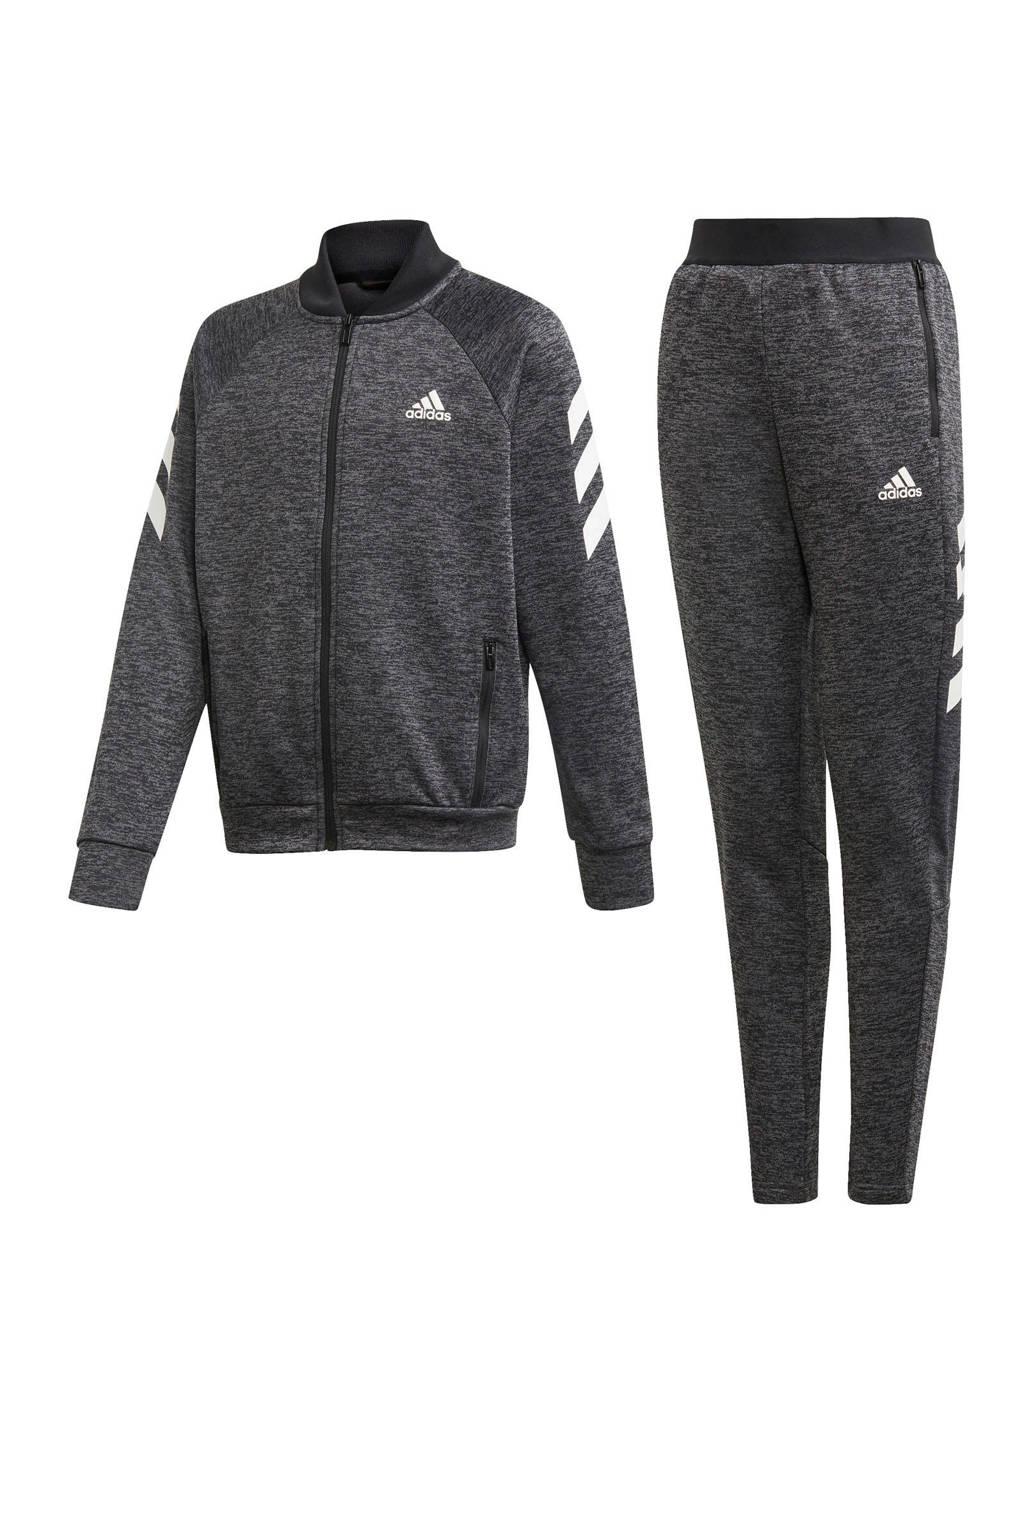 adidas performance   trainingspak zwart melange/wit